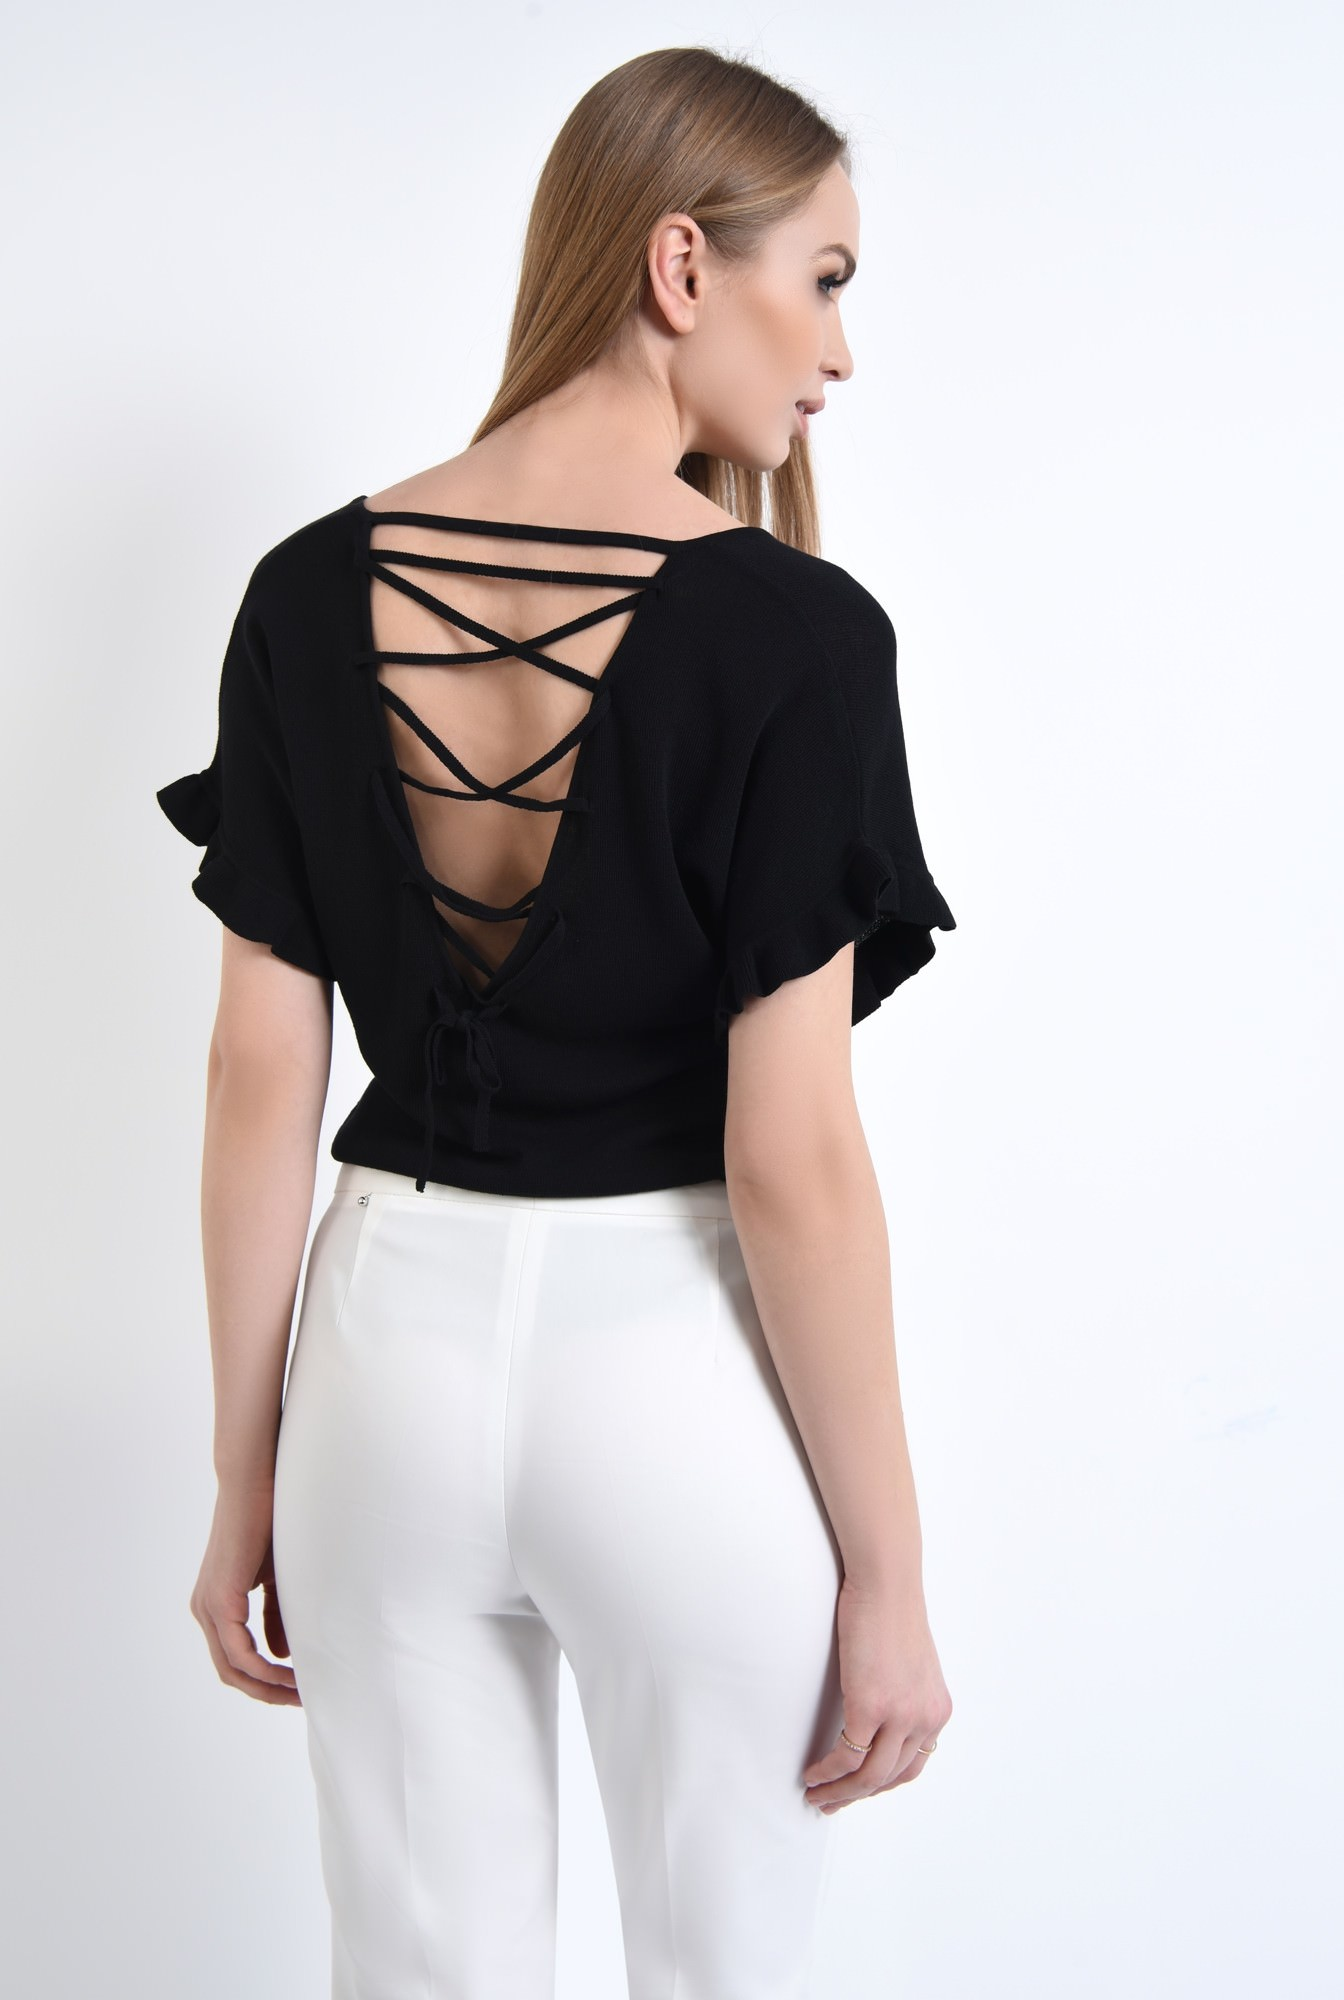 1 - Bluza casual, tricotaj, negru